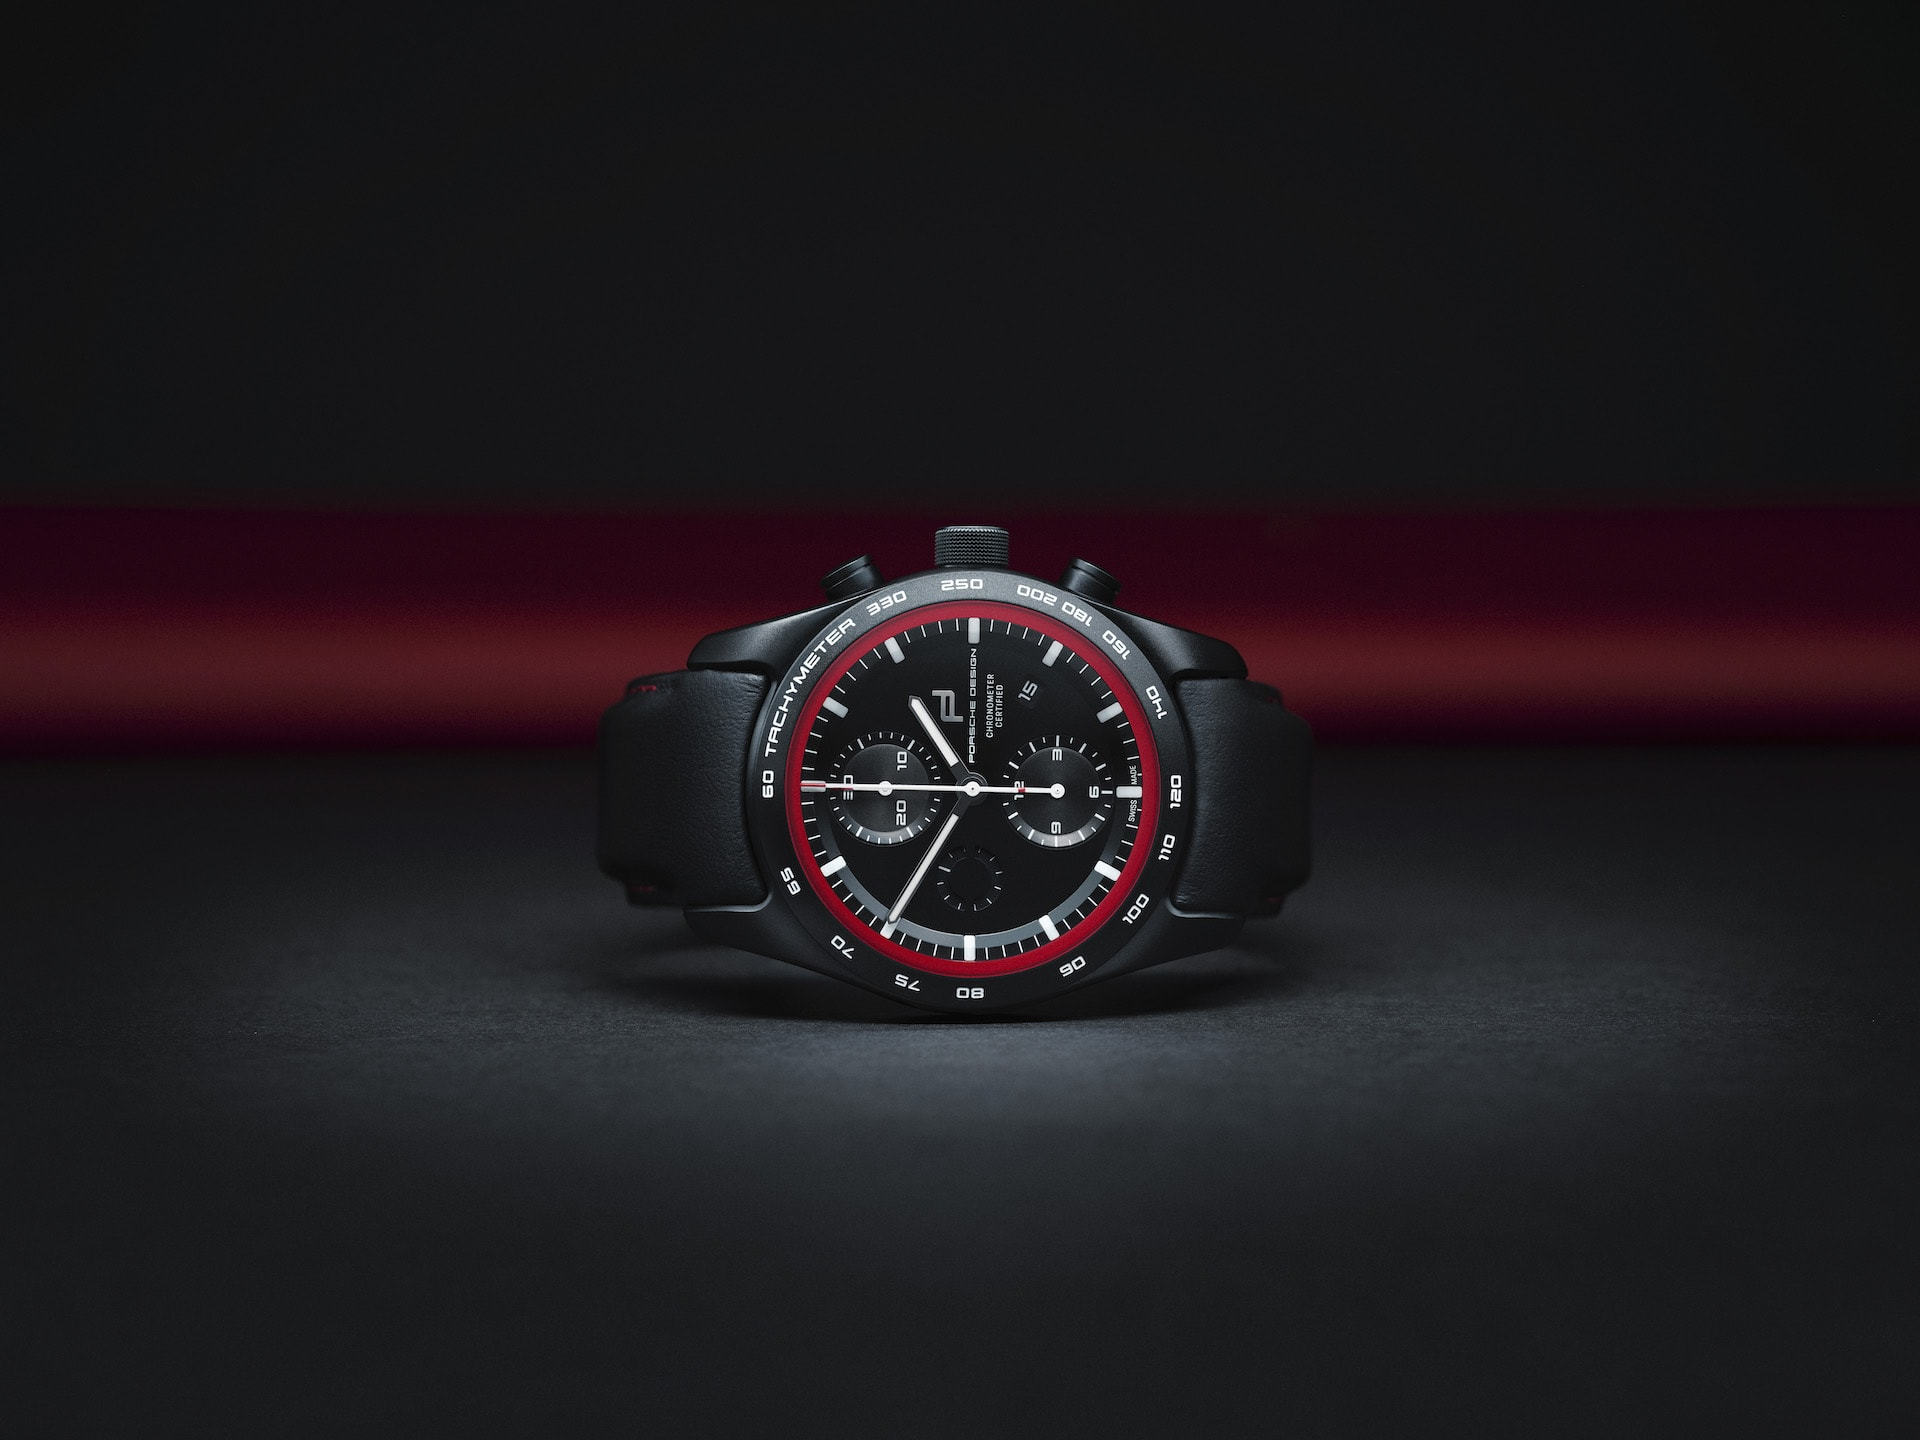 Porsche Design presents a unique Custom-Built Timepieces Program 7